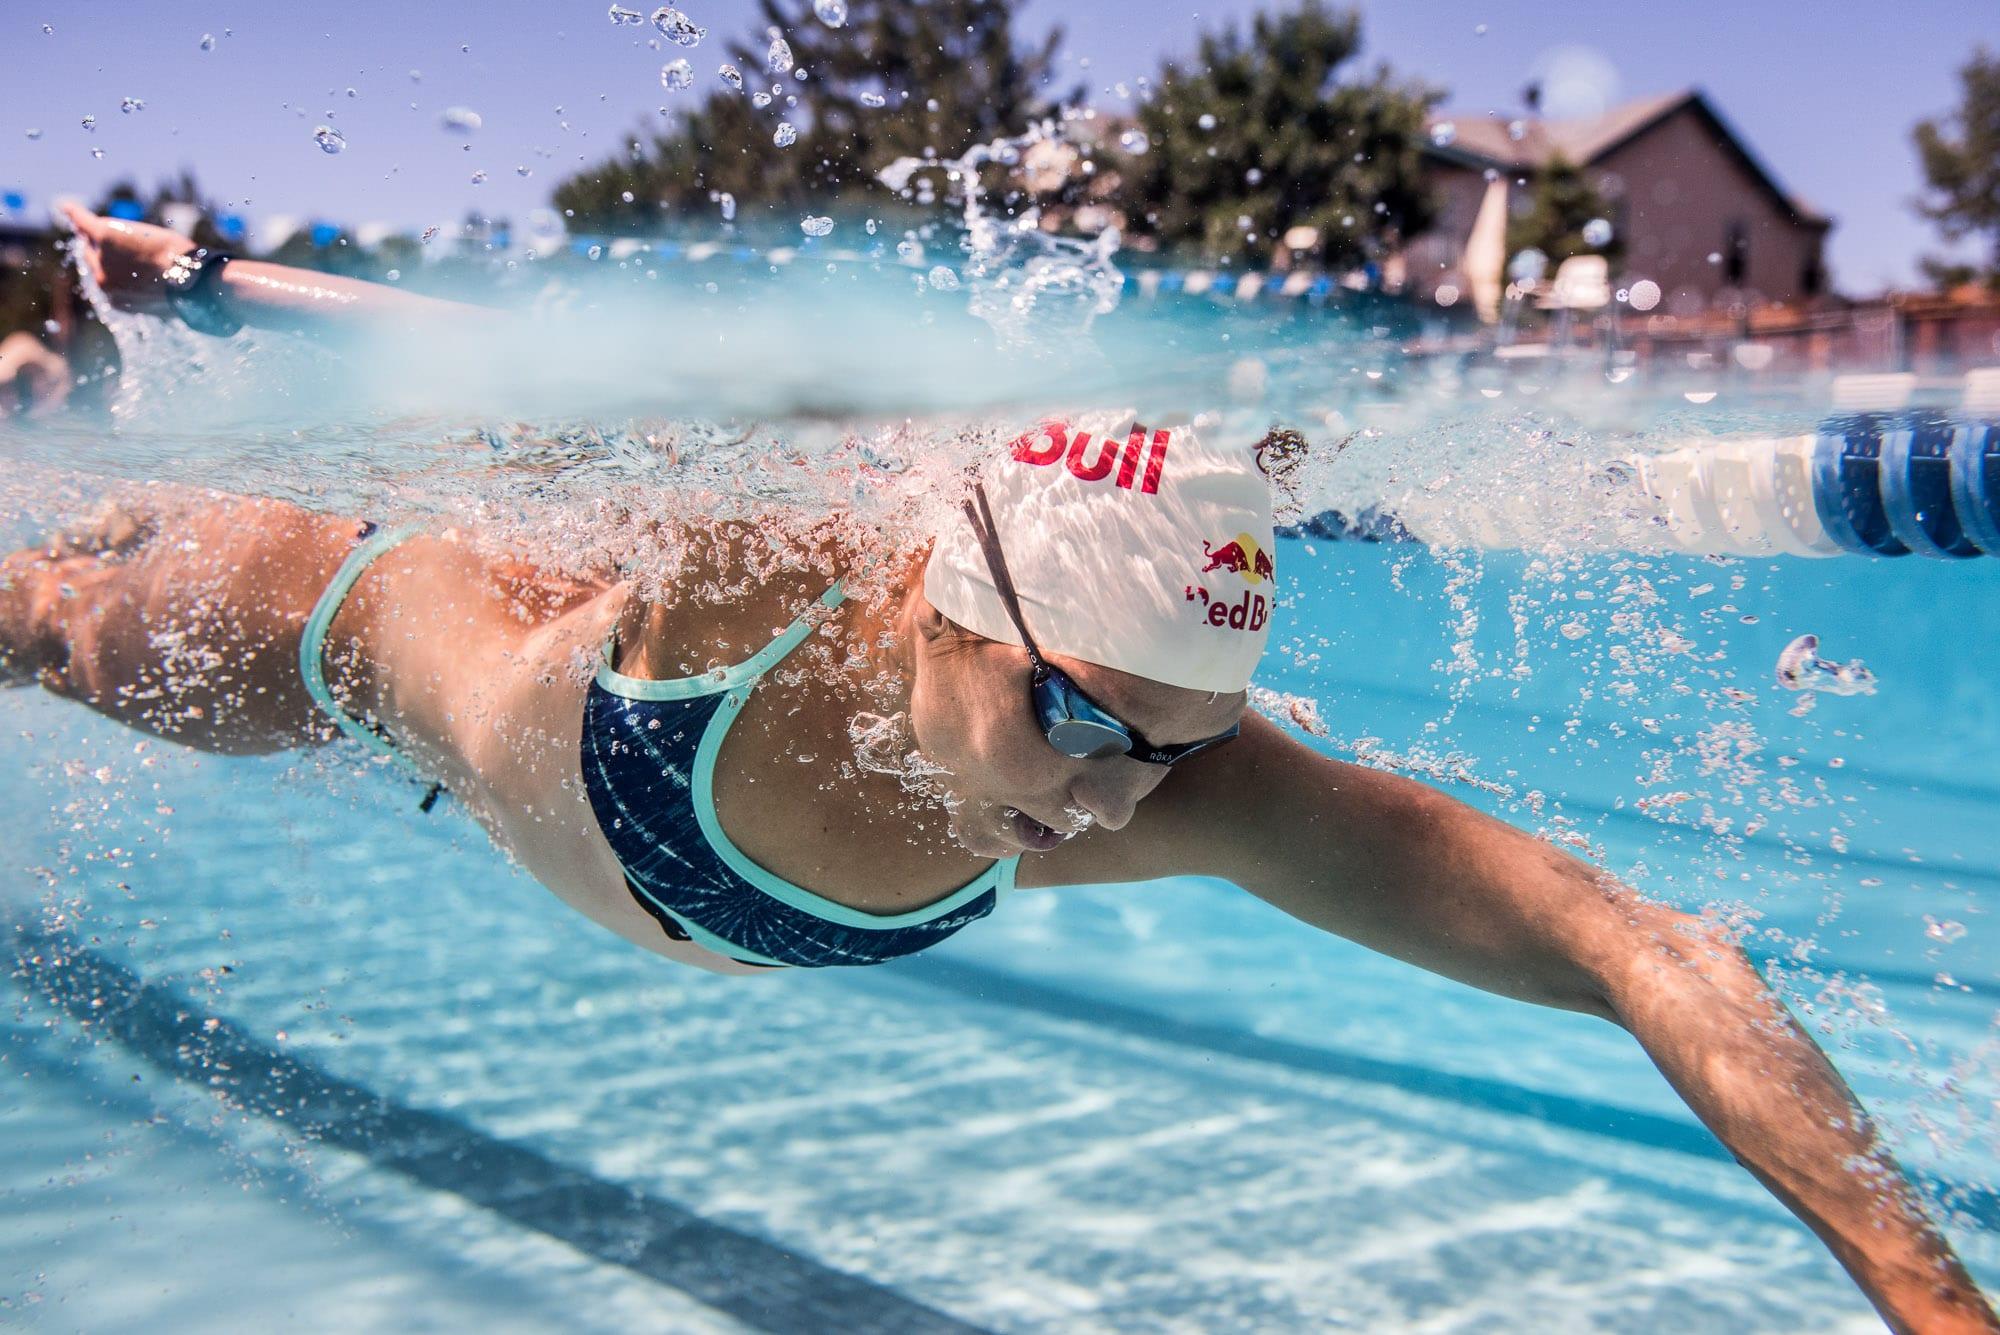 Entrenamiento-de-natación-para-adelgazar-1